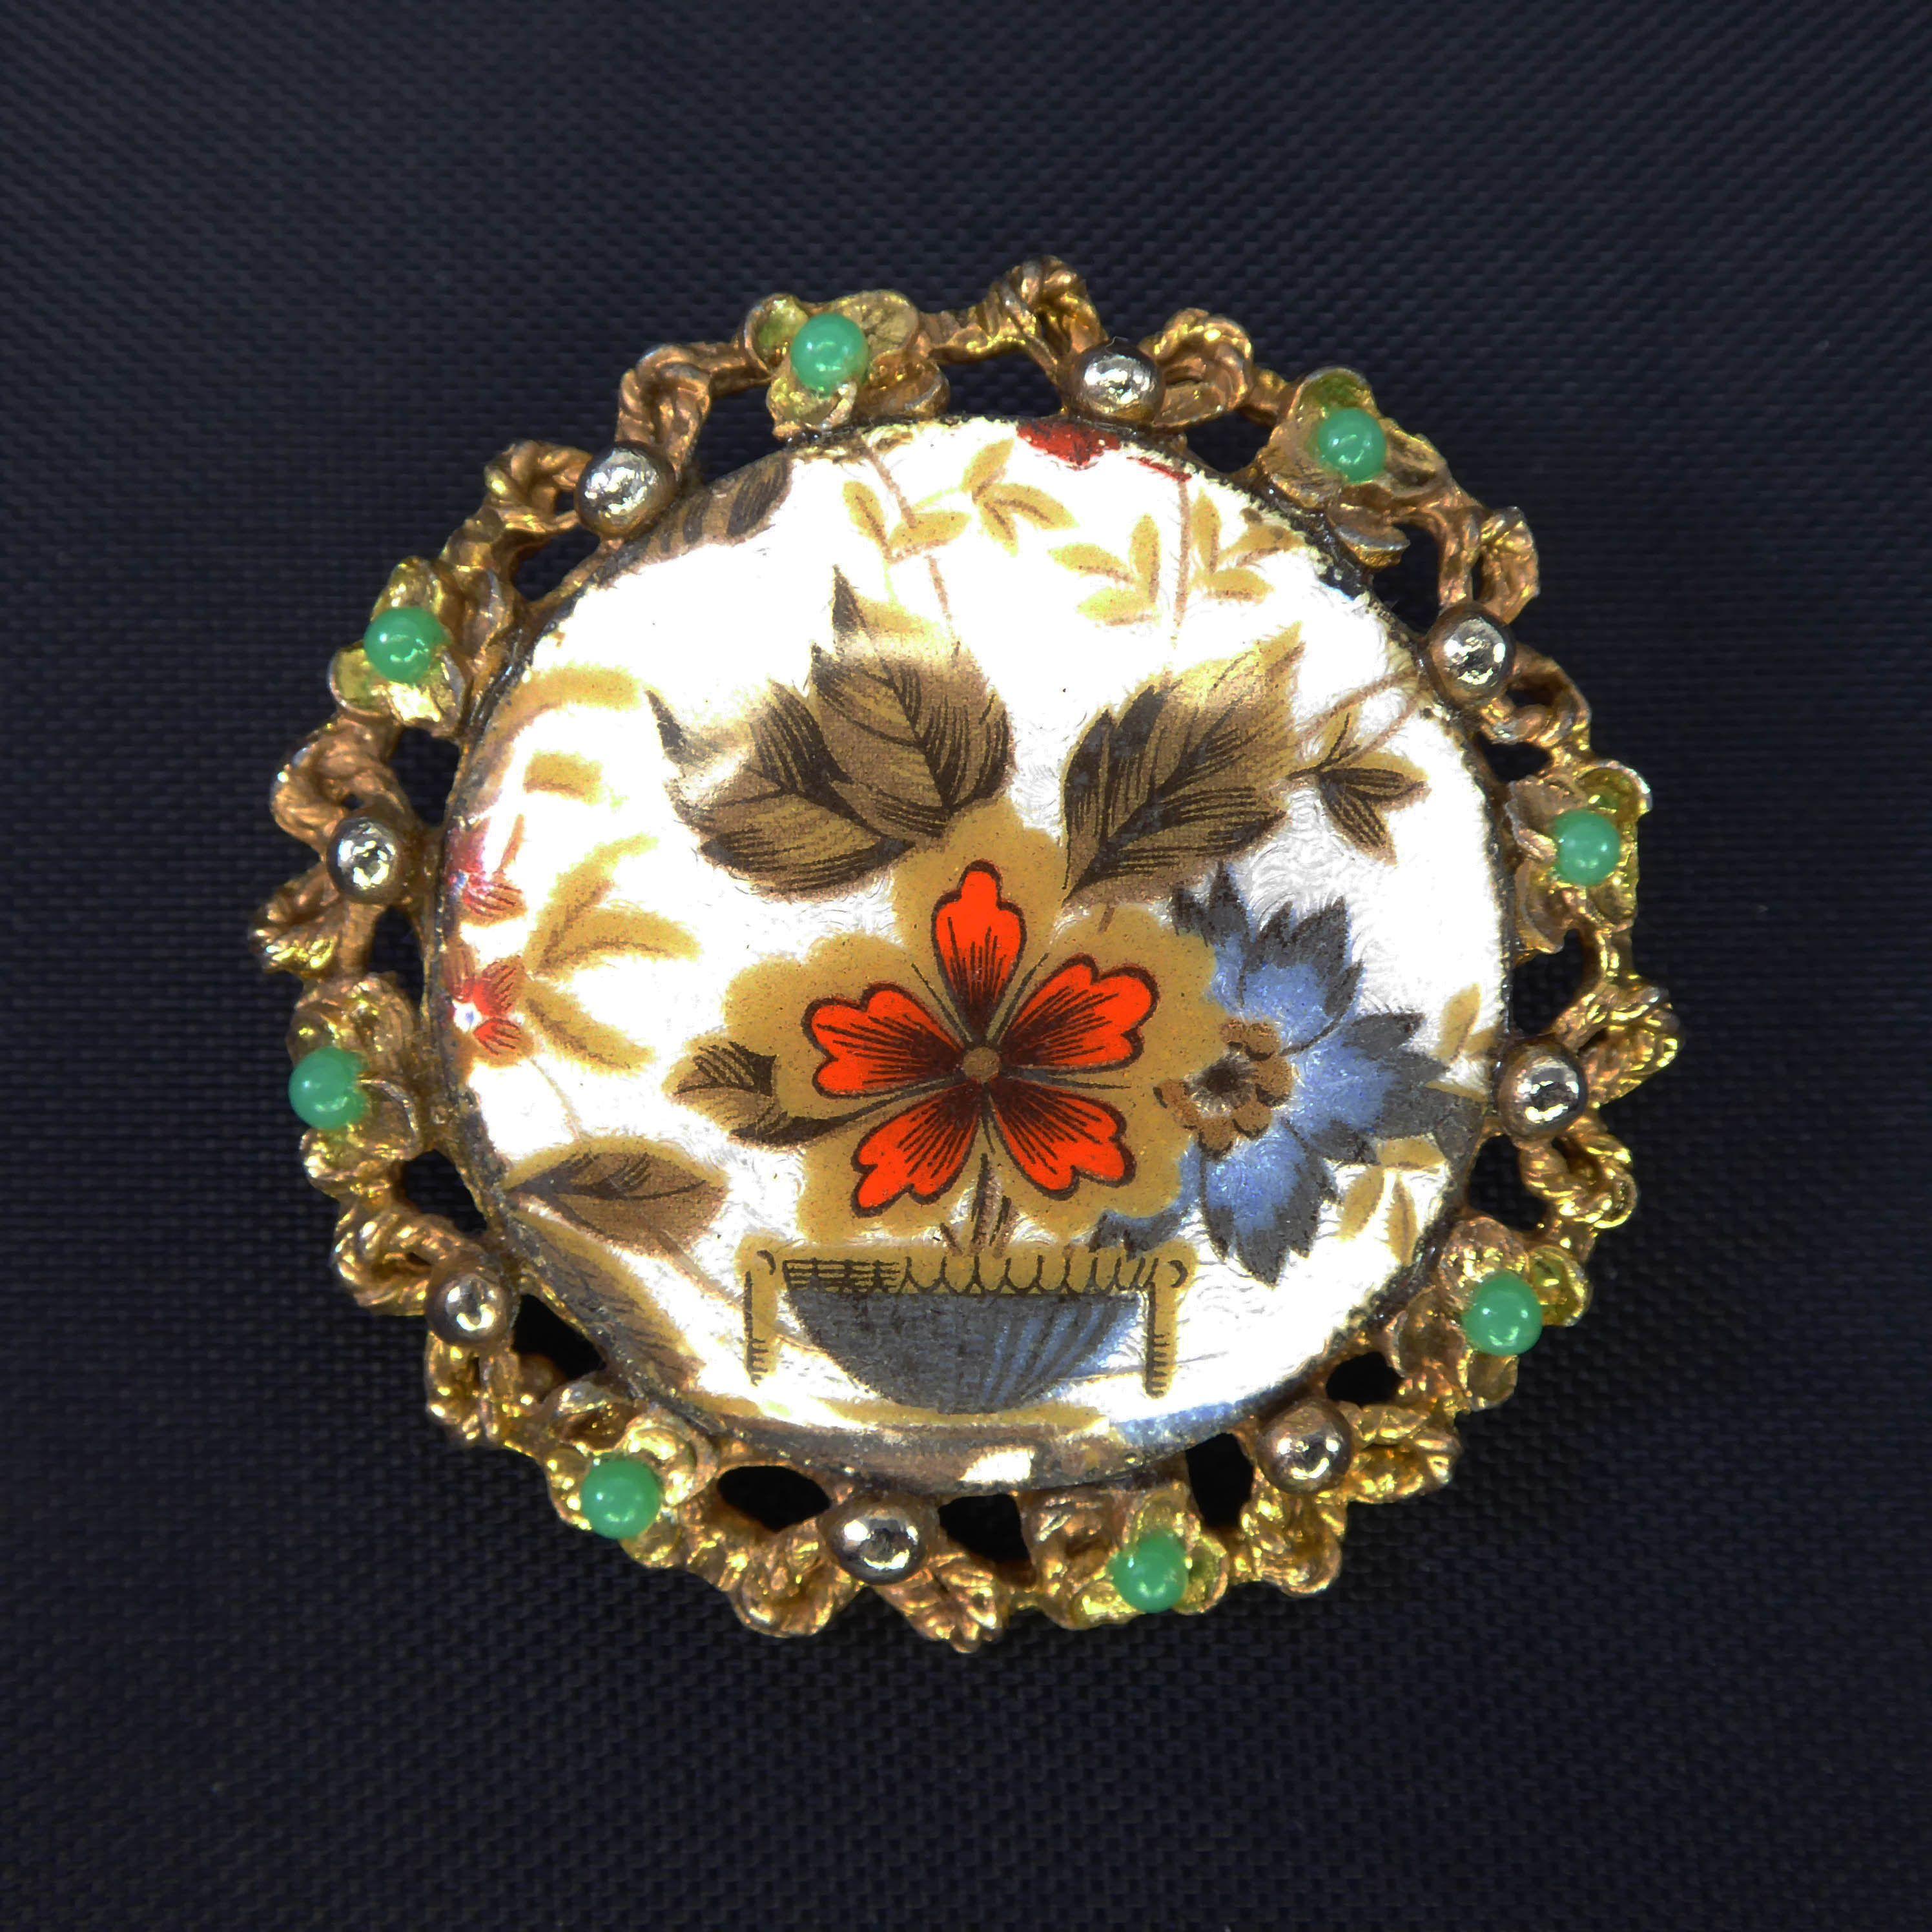 Vintage Tassel Brooch Vintage Wedding Brooch Vintage Guilloche Brooch Vintage Gold Plated Guilloche Tassel Brooch Vintage Wedding Pin